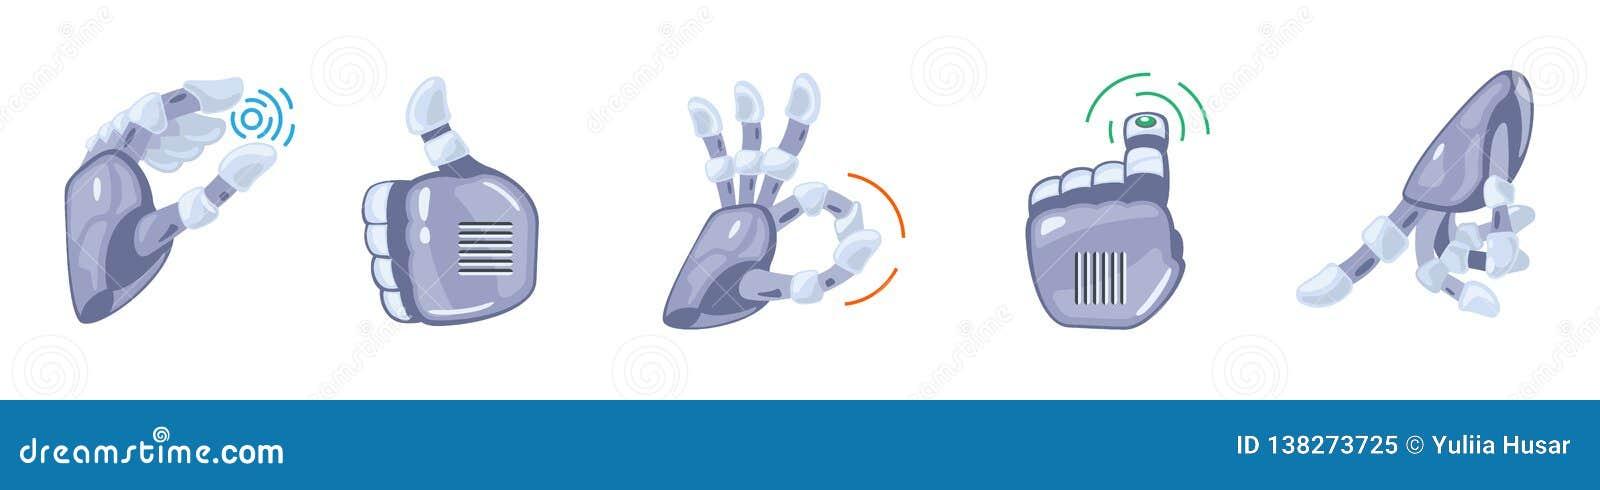 Robot hand gestures. Robotic hands. Mechanical technology machine engineering symbol. Hand gestures set. Signs.